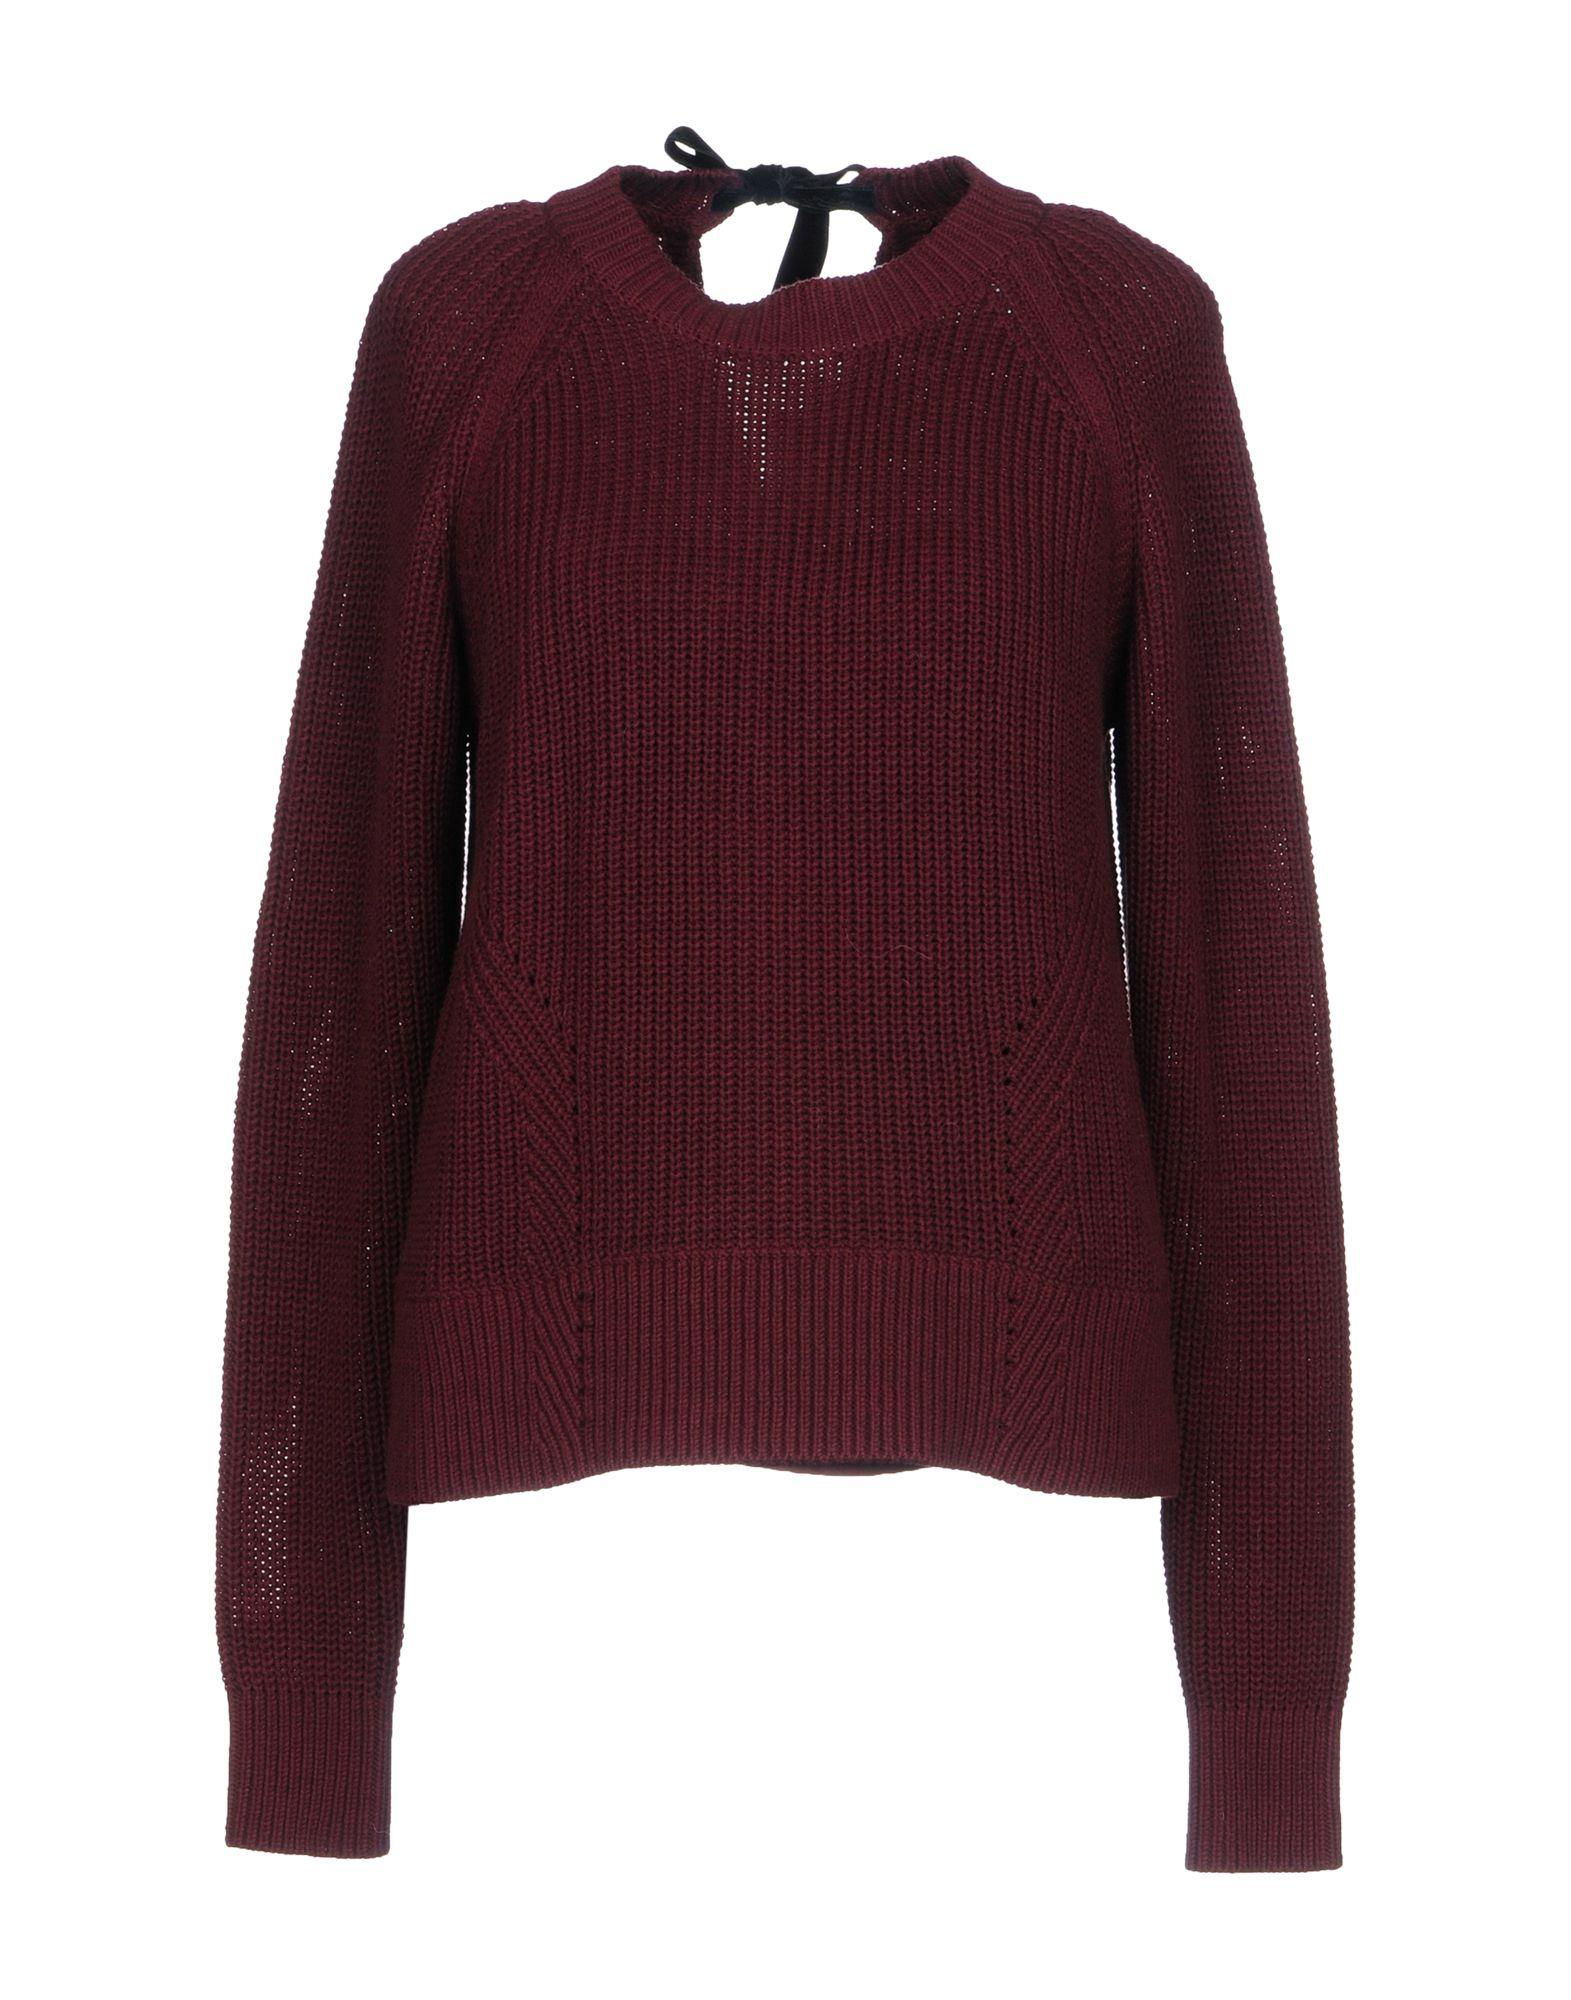 Muveil Sweater In Deep Purple